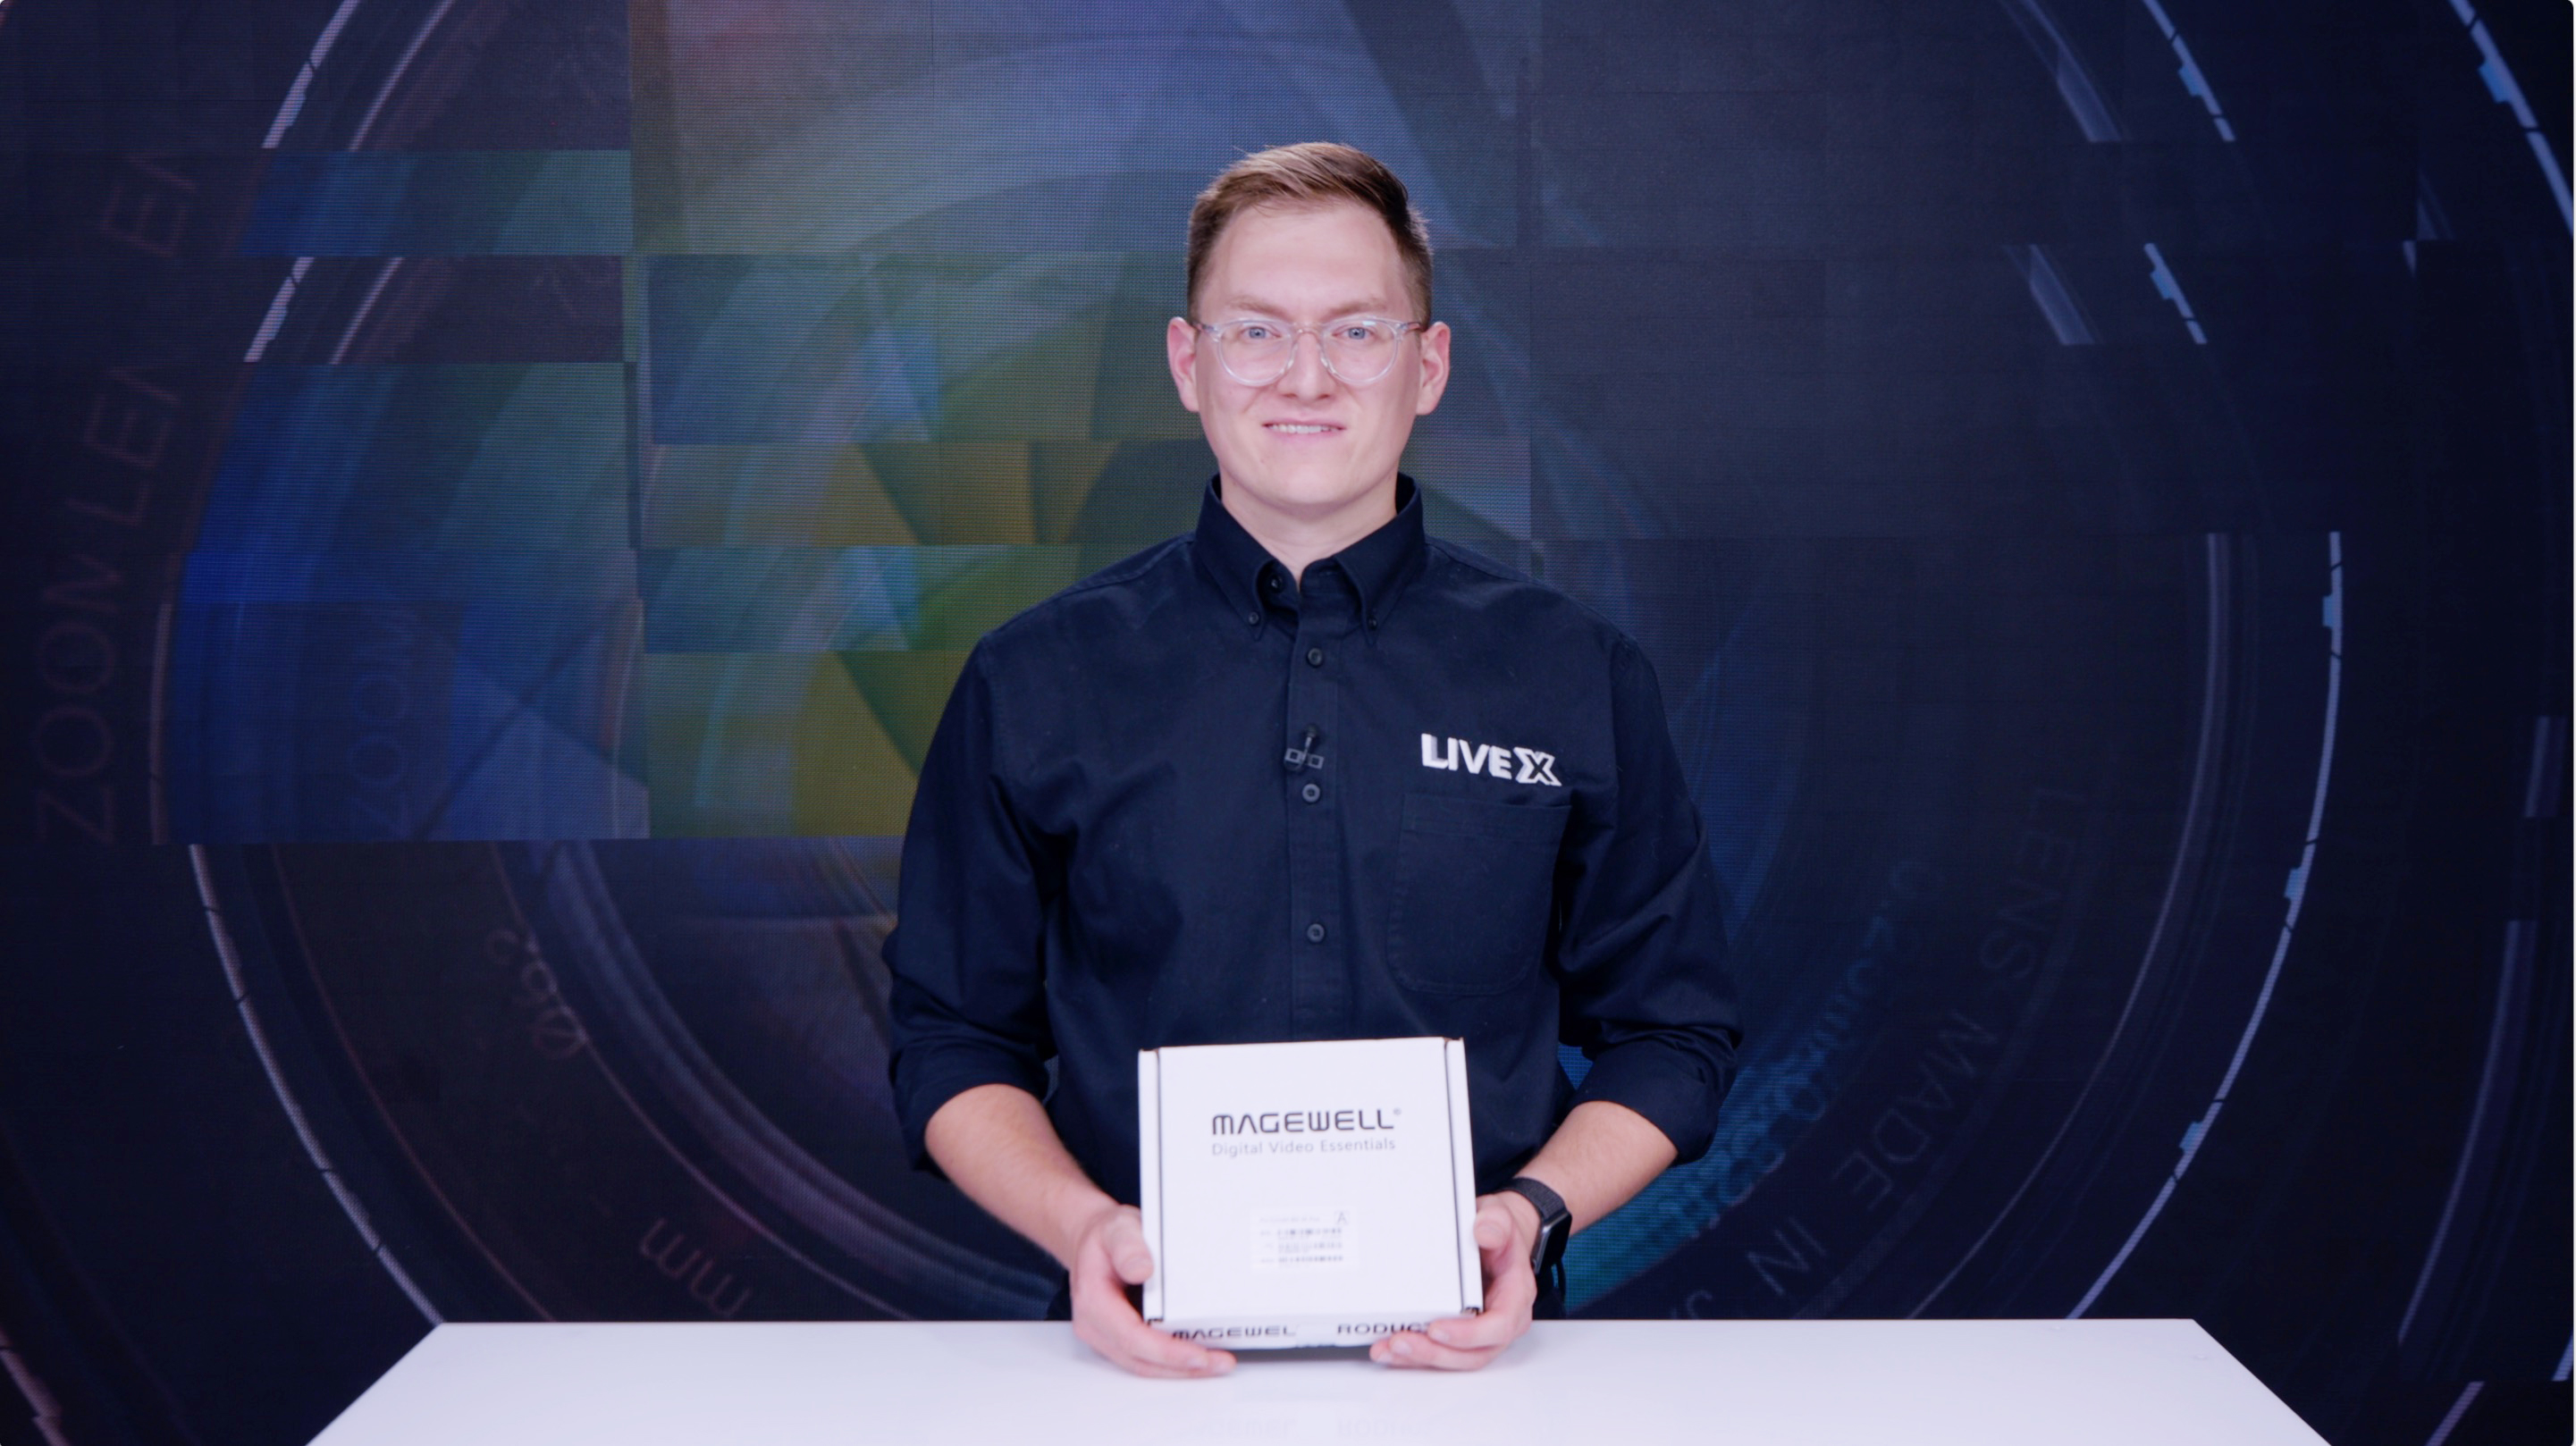 Unboxing: Magewell Pro Convert SDI 4K Plus | Live X